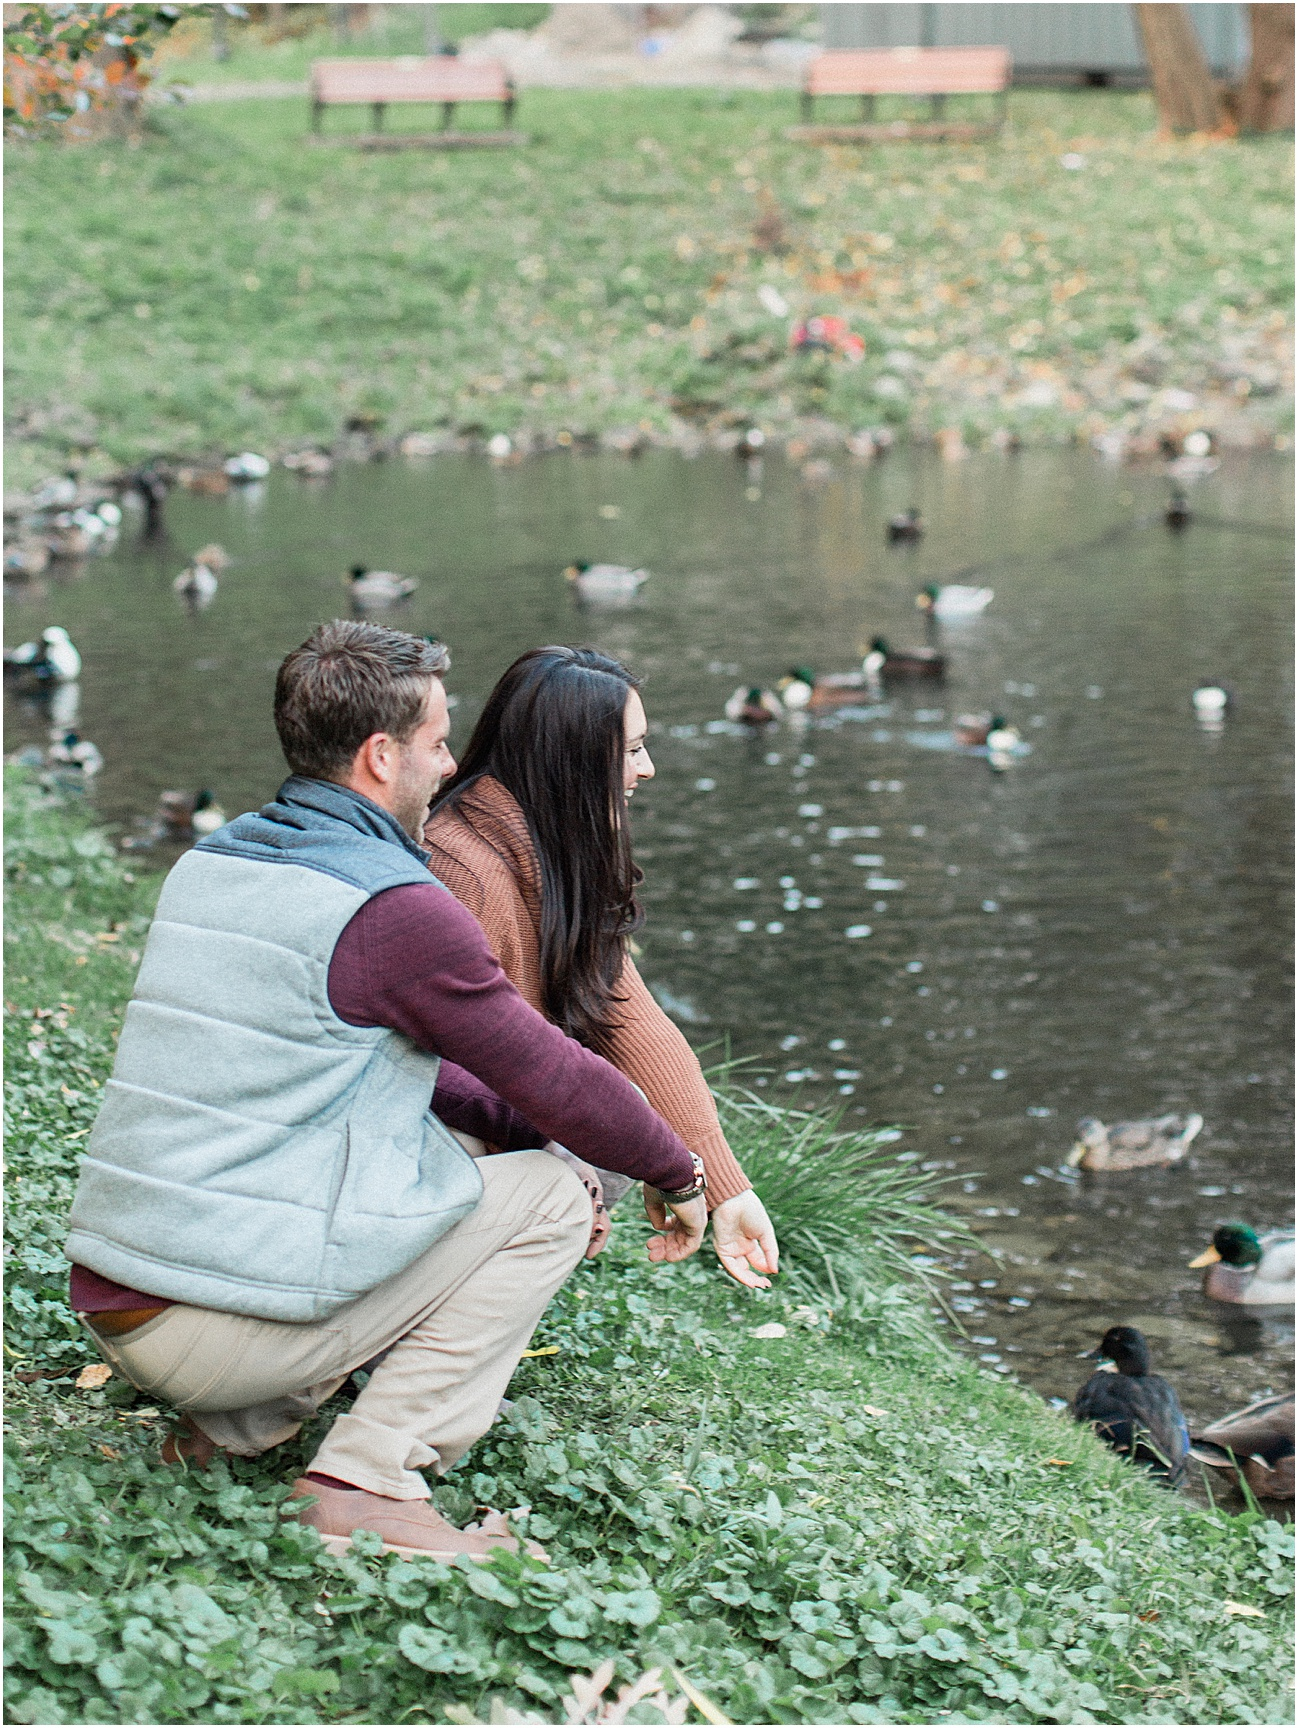 tiffany_doug_saratoga_springs_engagement_fall_cape_cod_boston_wedding_photographer_meredith_jane_photography_photo_1485.jpg